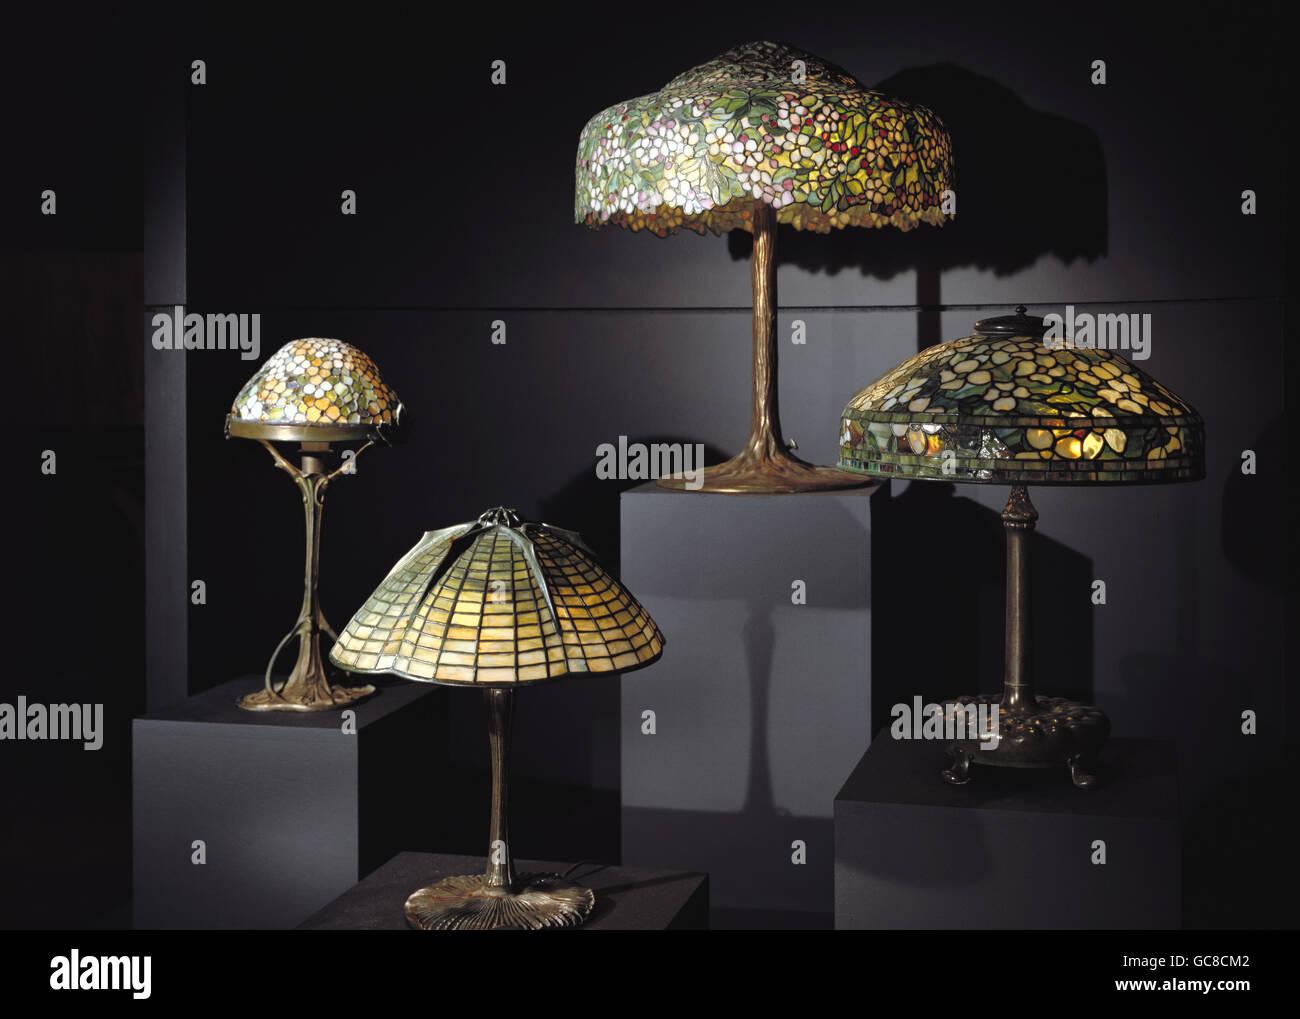 Tiffany Lampen Amsterdam : Tiffany lampen stockfotos tiffany lampen bilder alamy